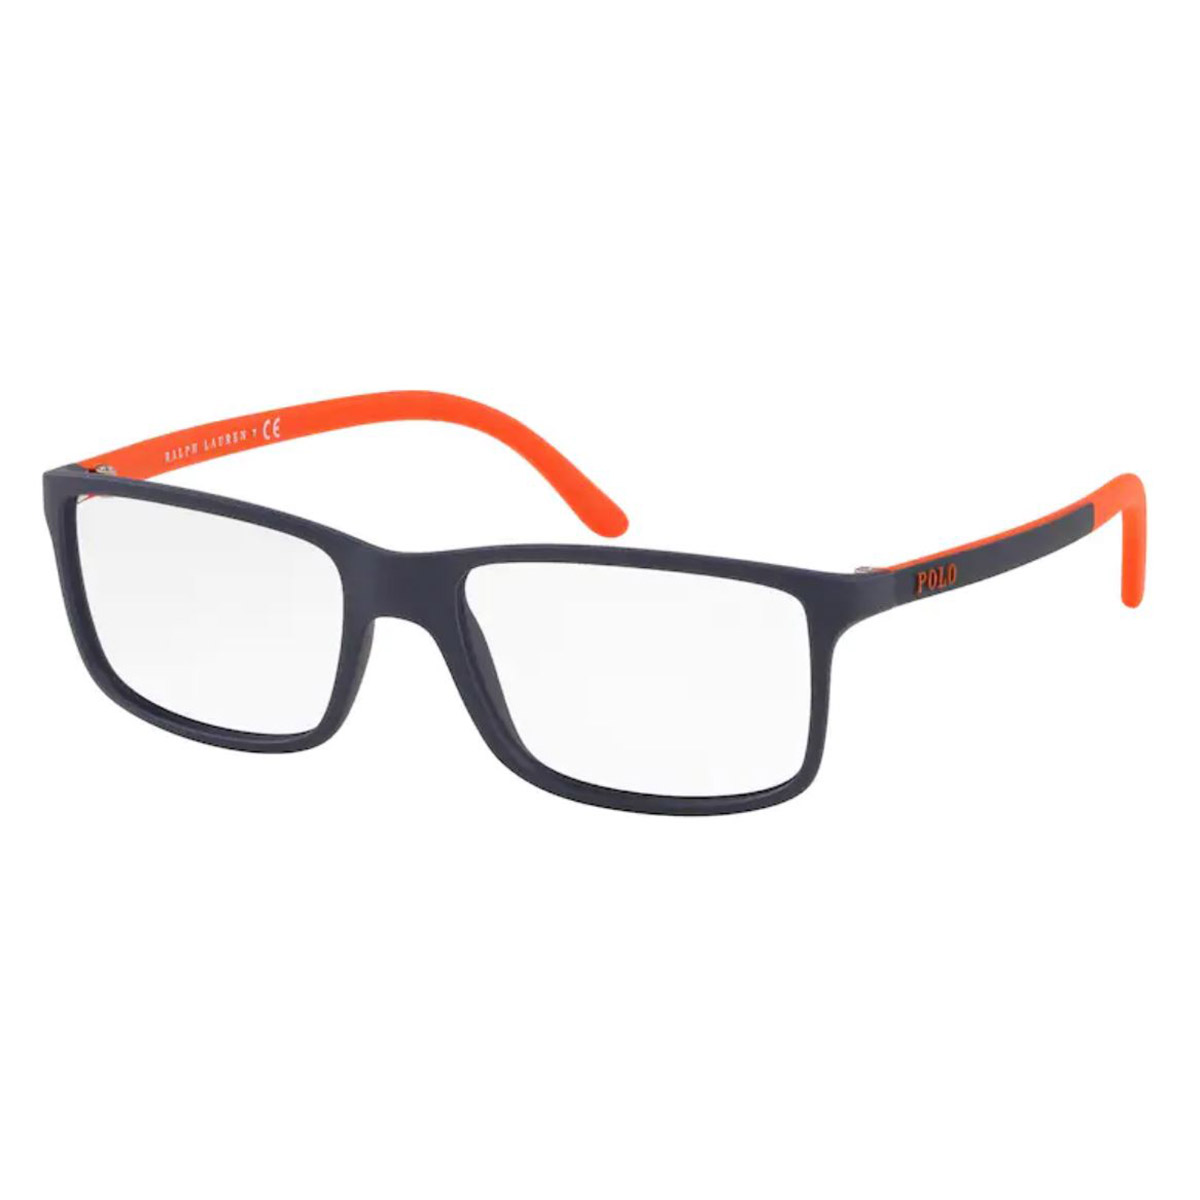 Óculos de Grau Masculino Polo Ralph Lauren PH2126 Azul com Laranja